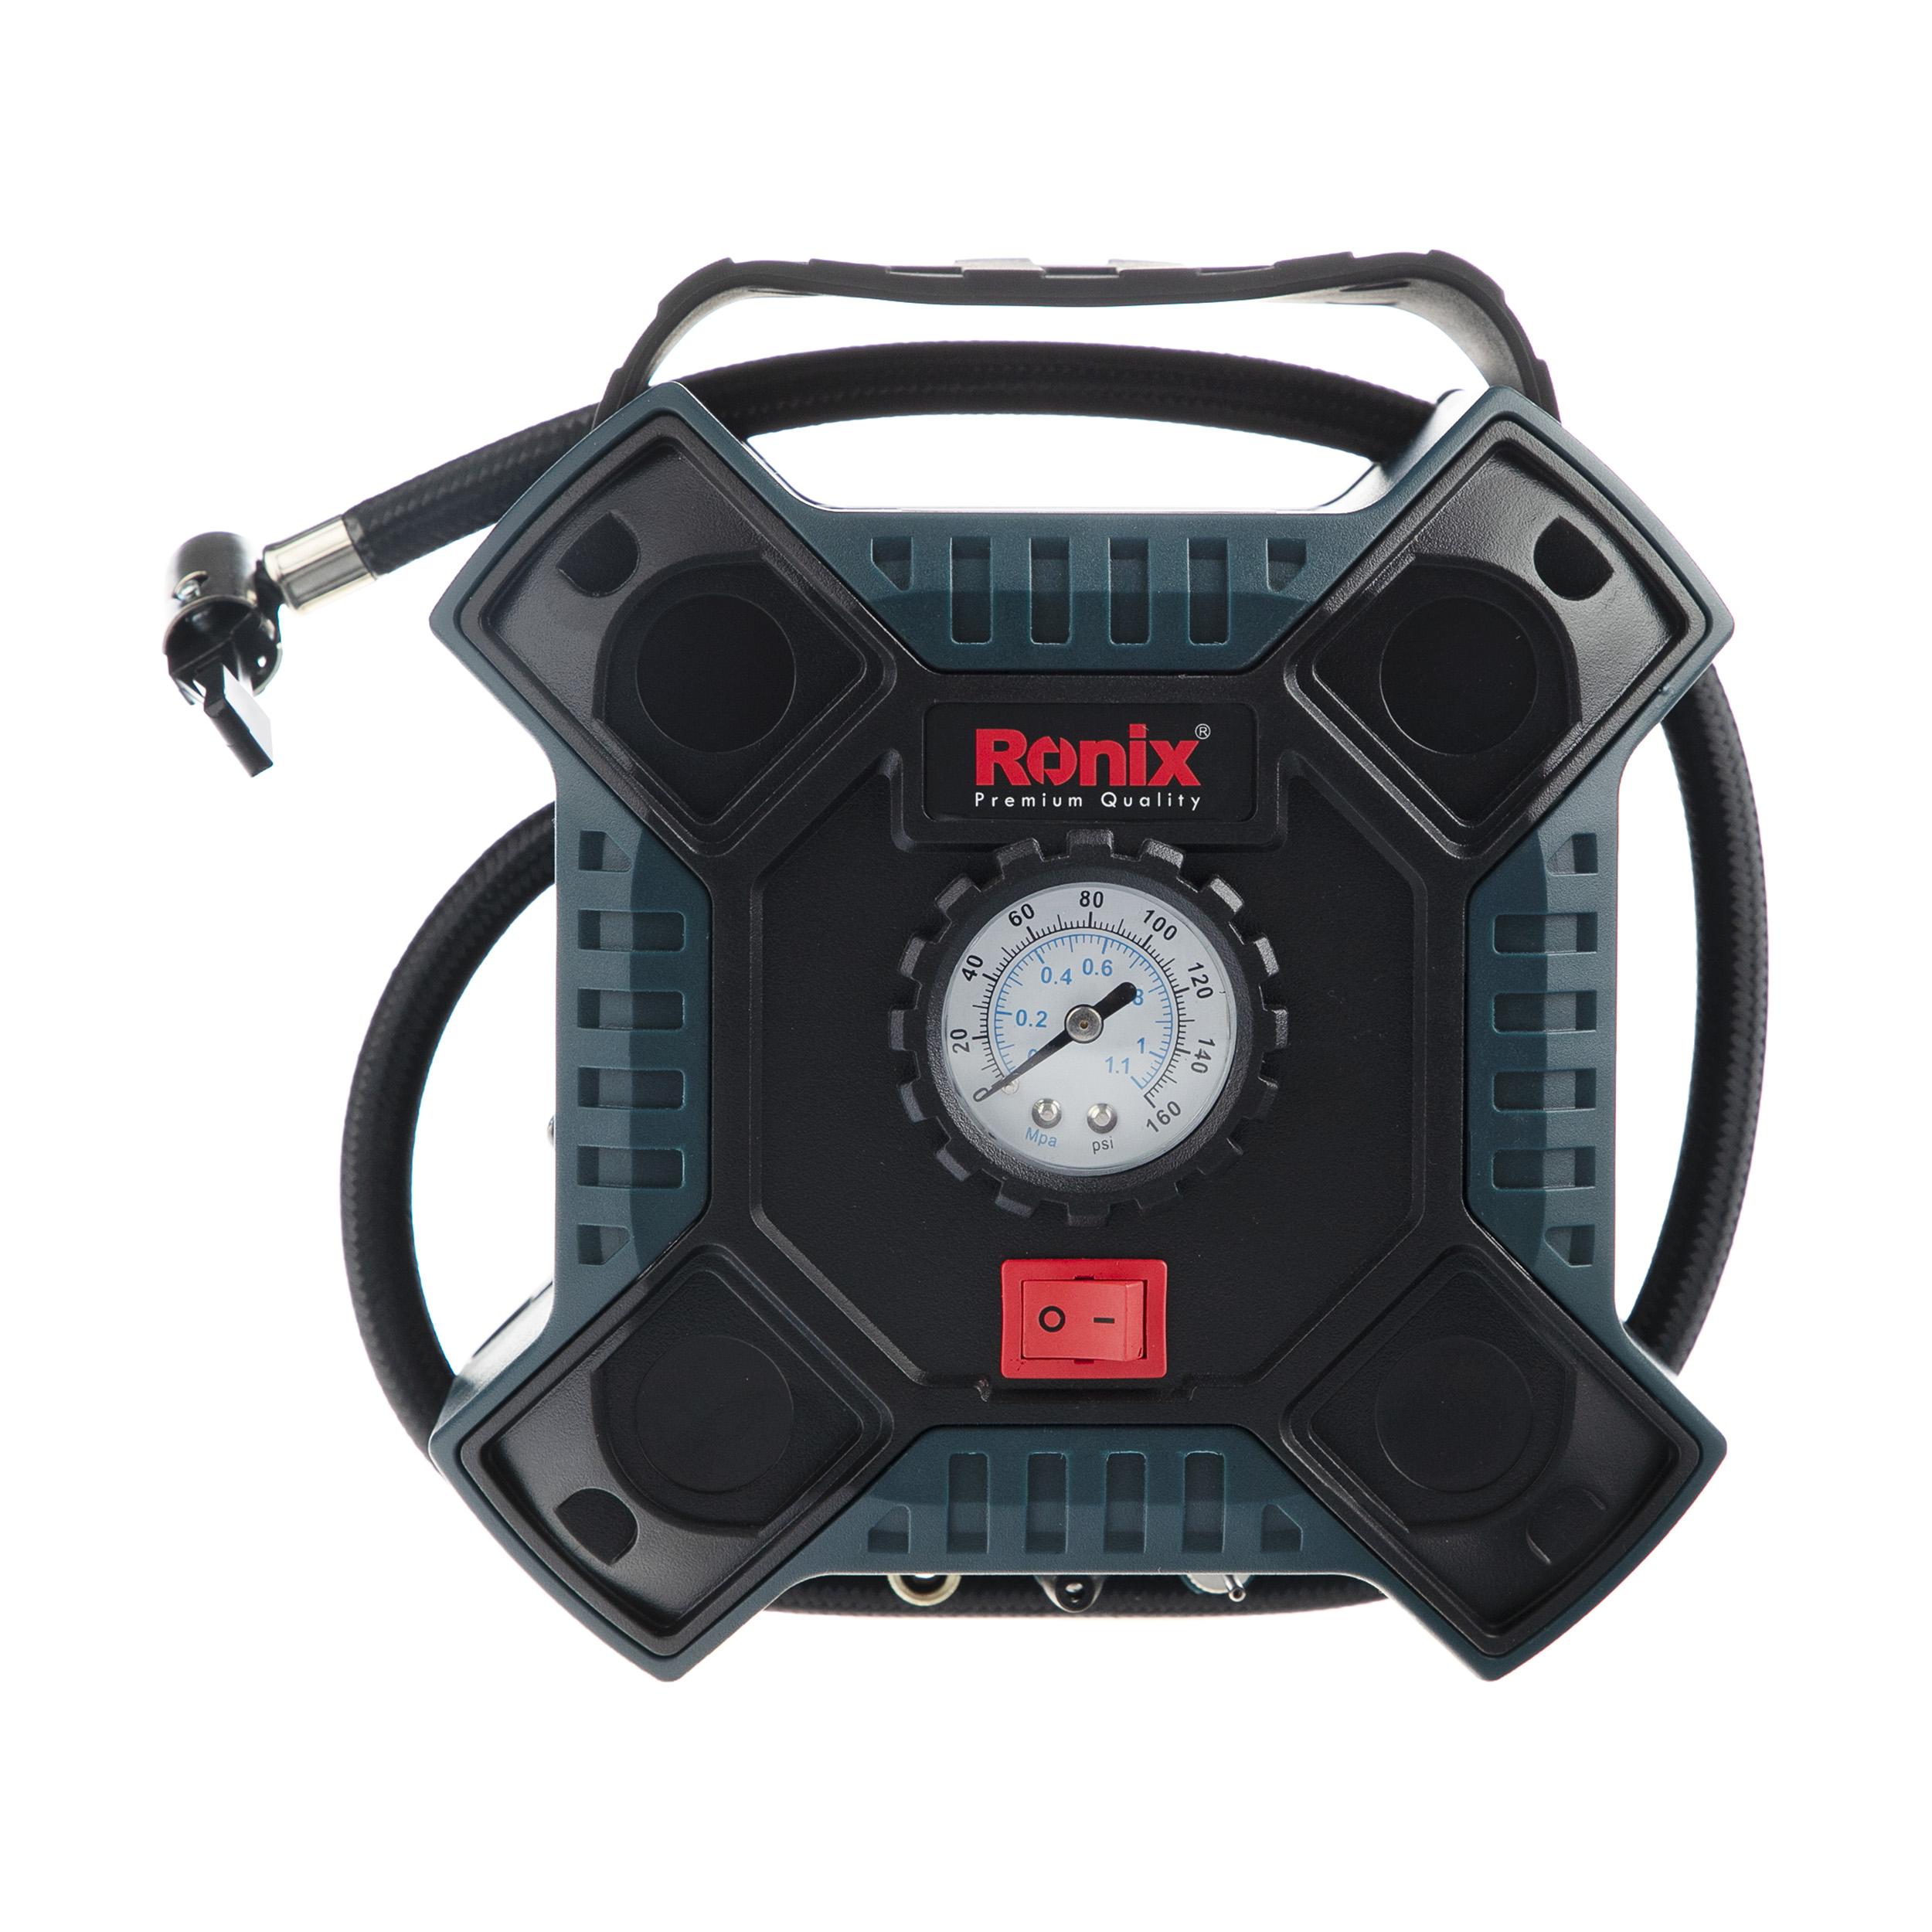 مینی کمپرسور باد فندکی  رونیکس مدل  RH_4263